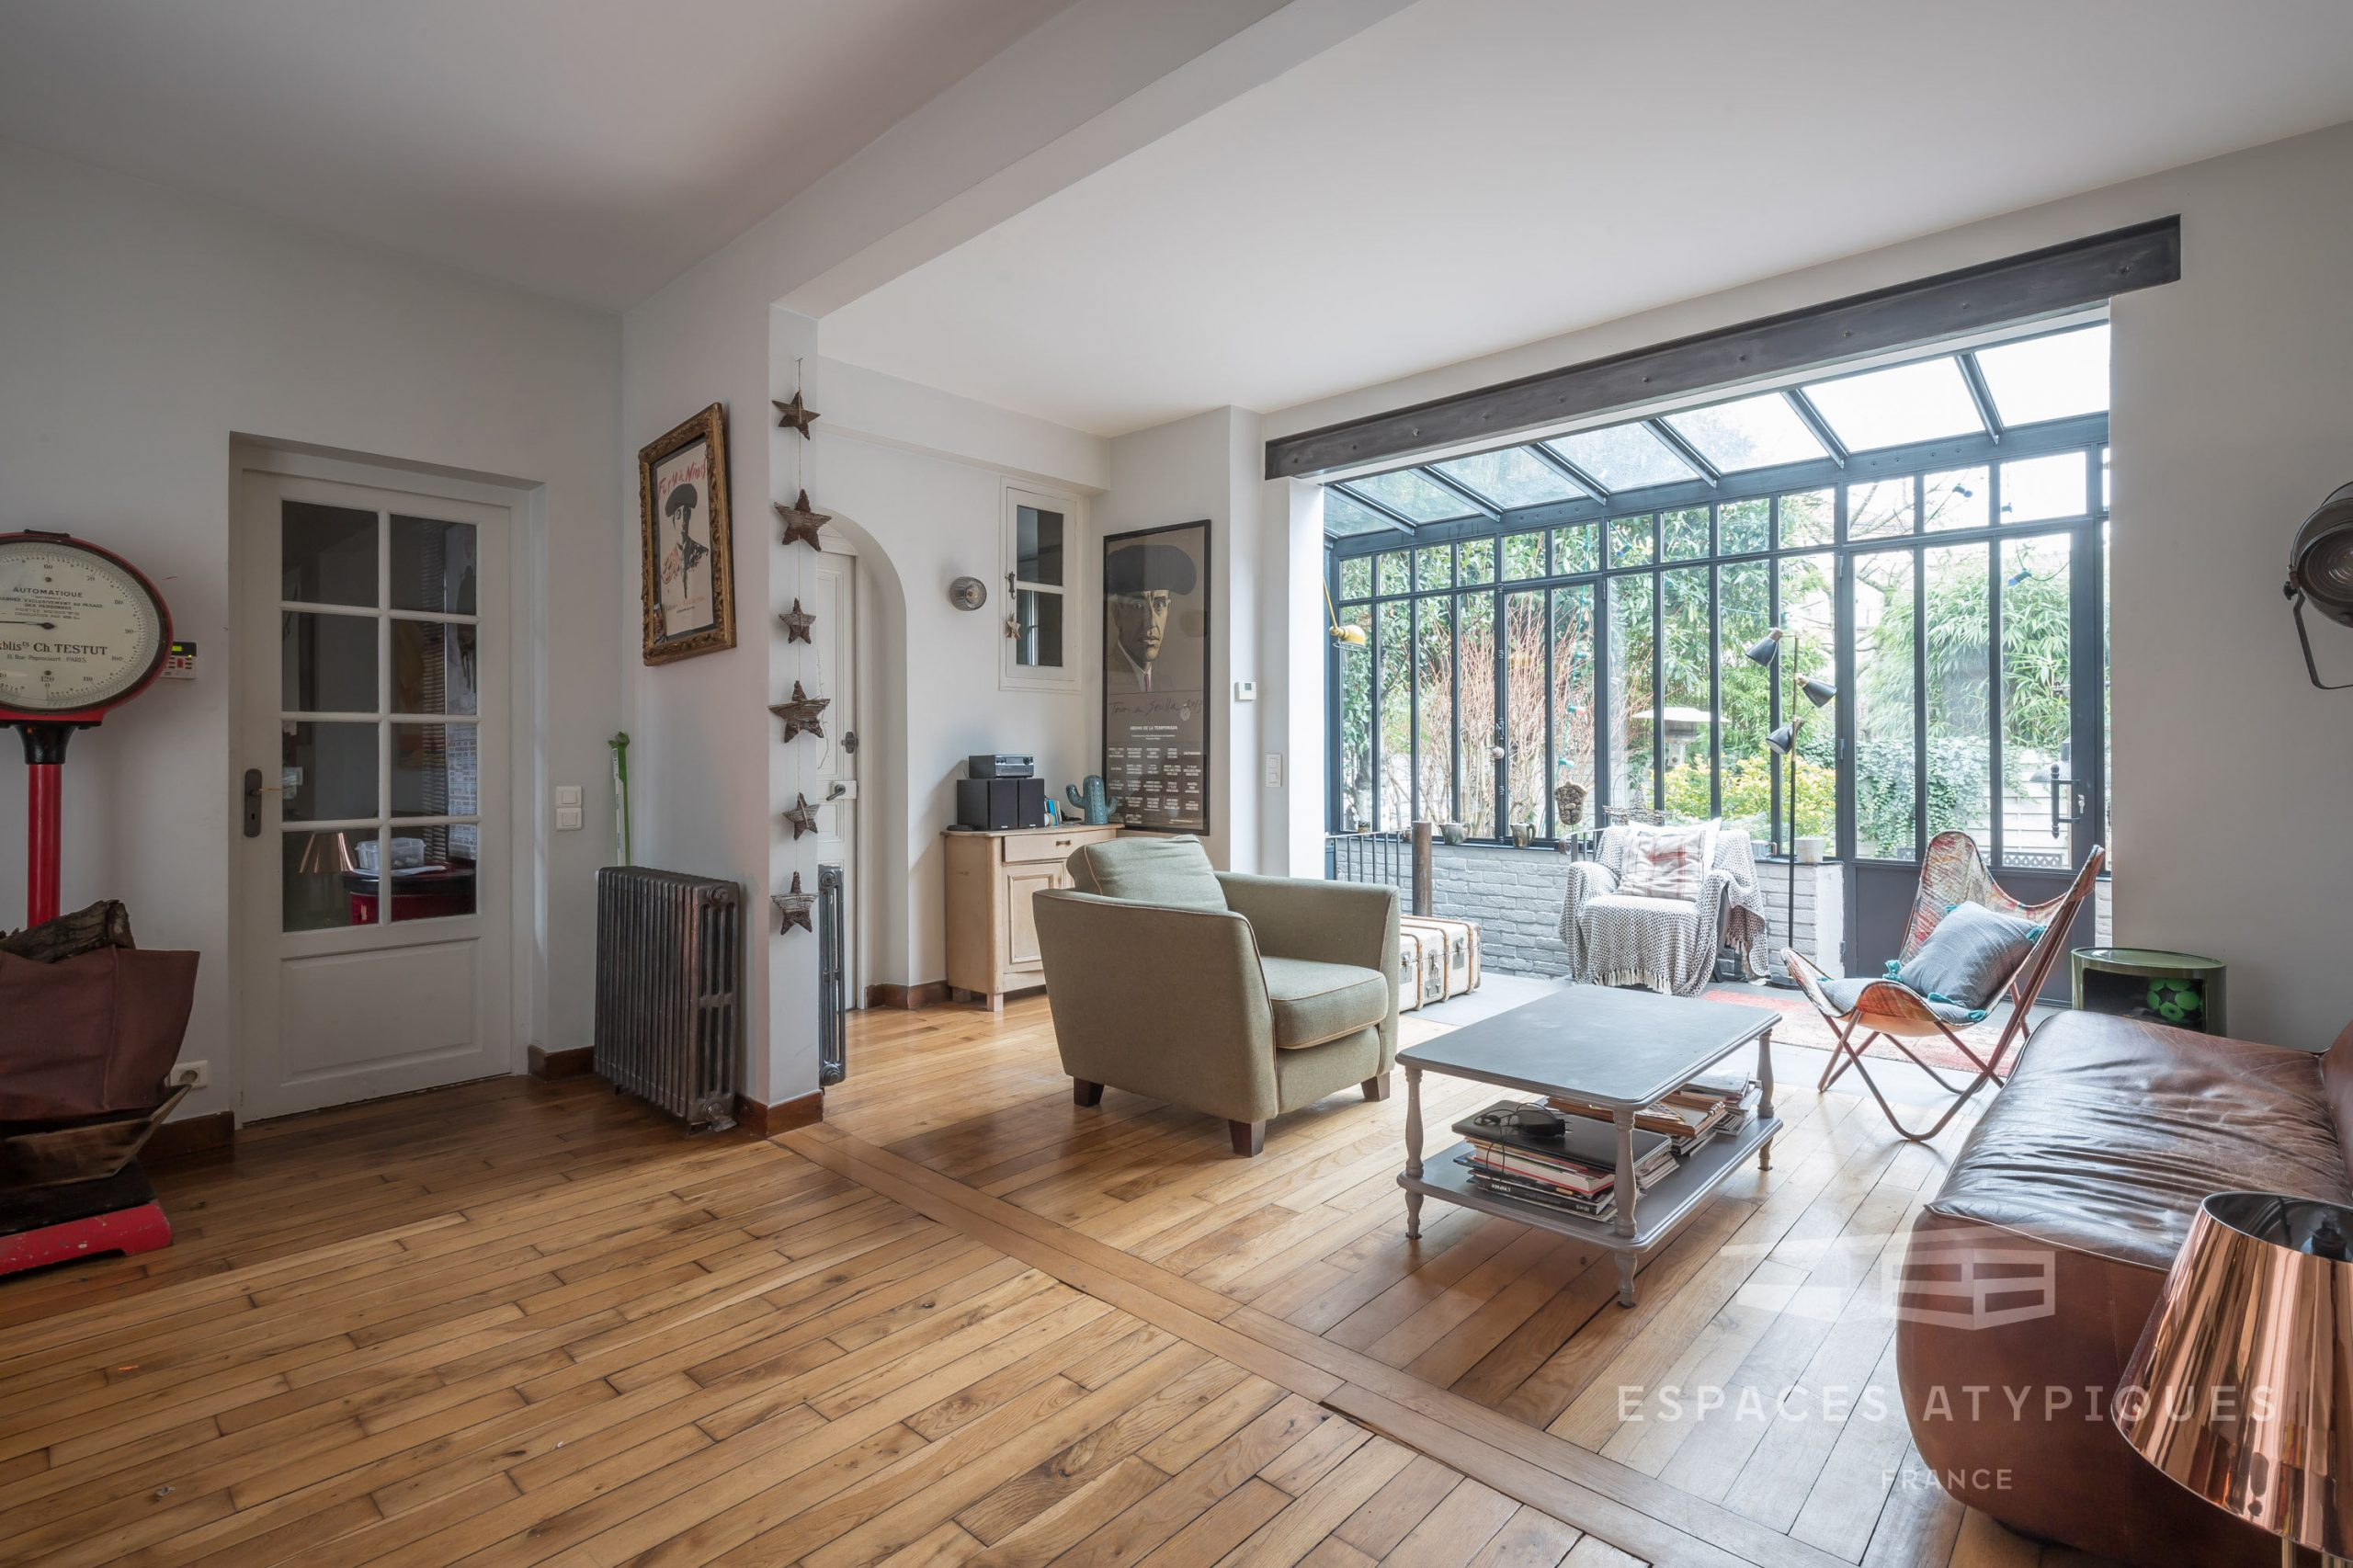 House With Glass Roof And Garden In Bagnolet 93170 dedans Verriere Jardin